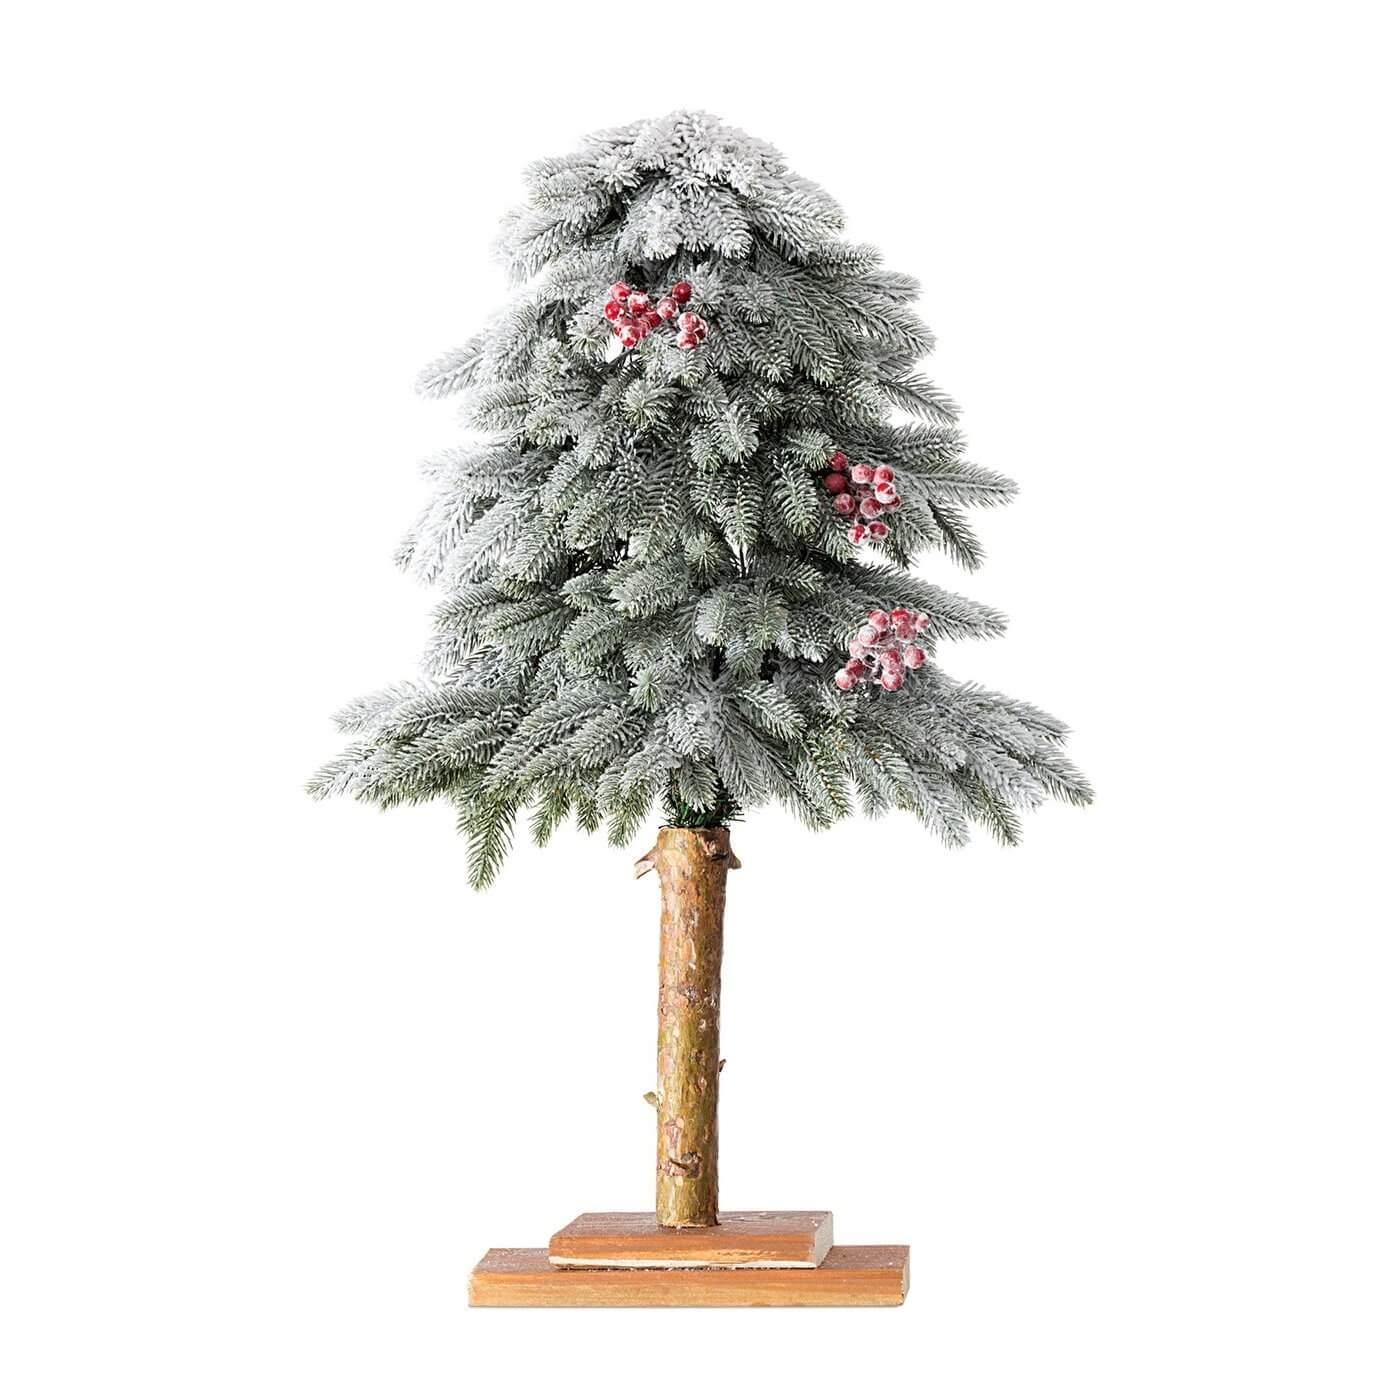 pomysł na prezent na Święta eurofirany.com.pl